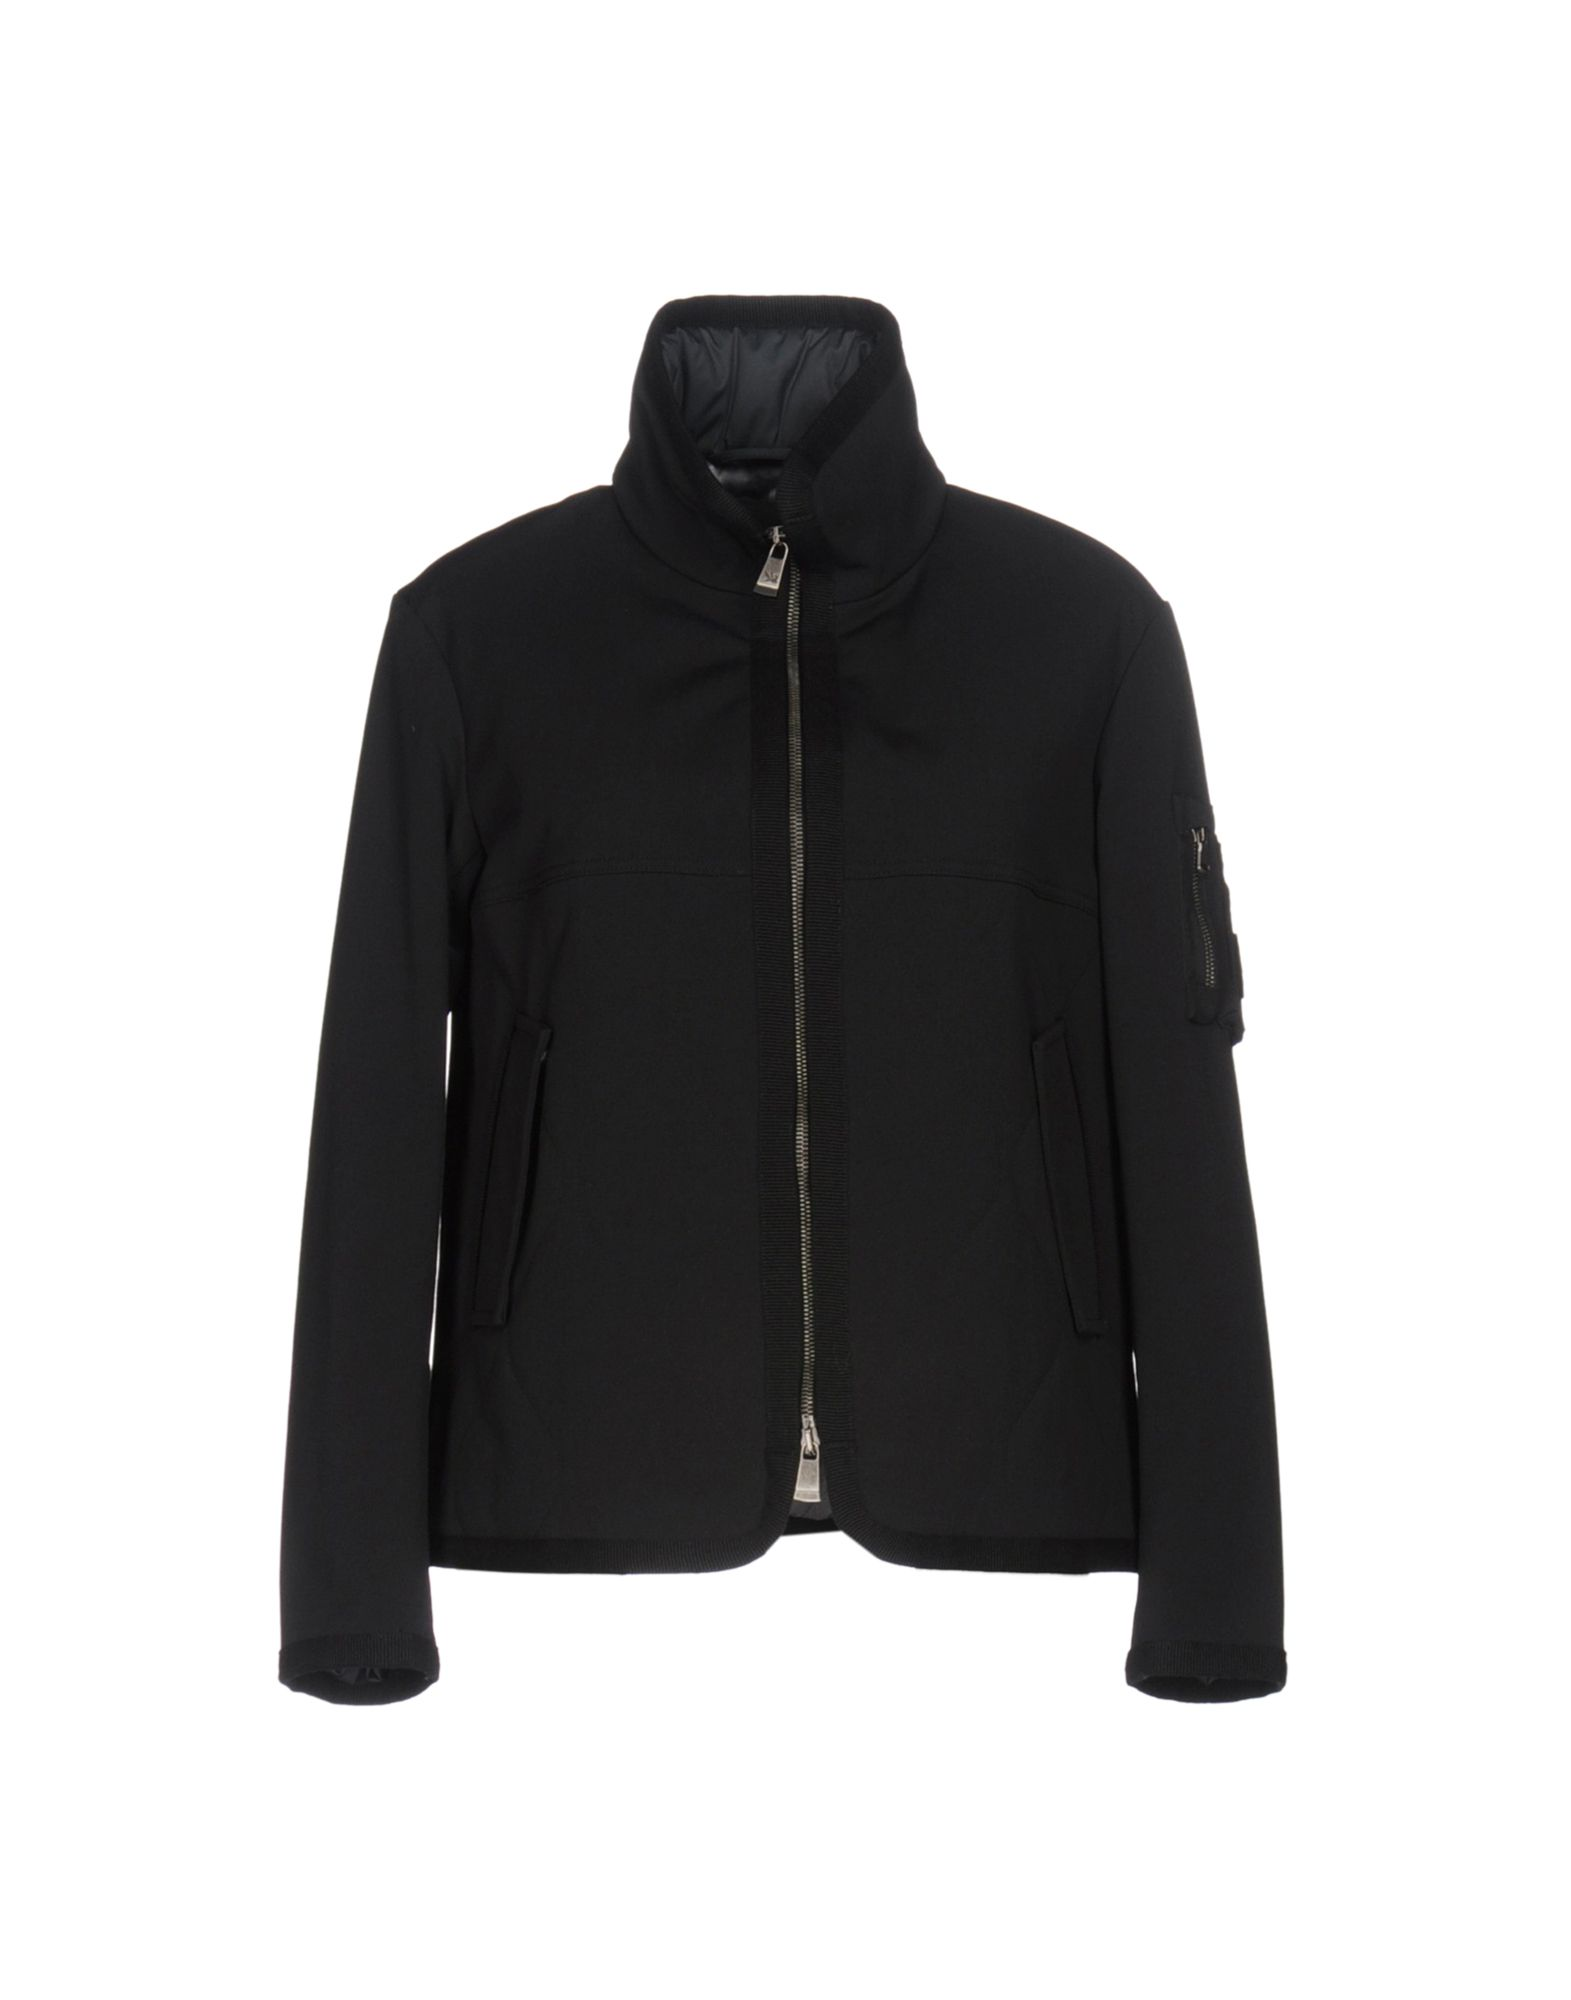 SPIEWAK Jacket in Black